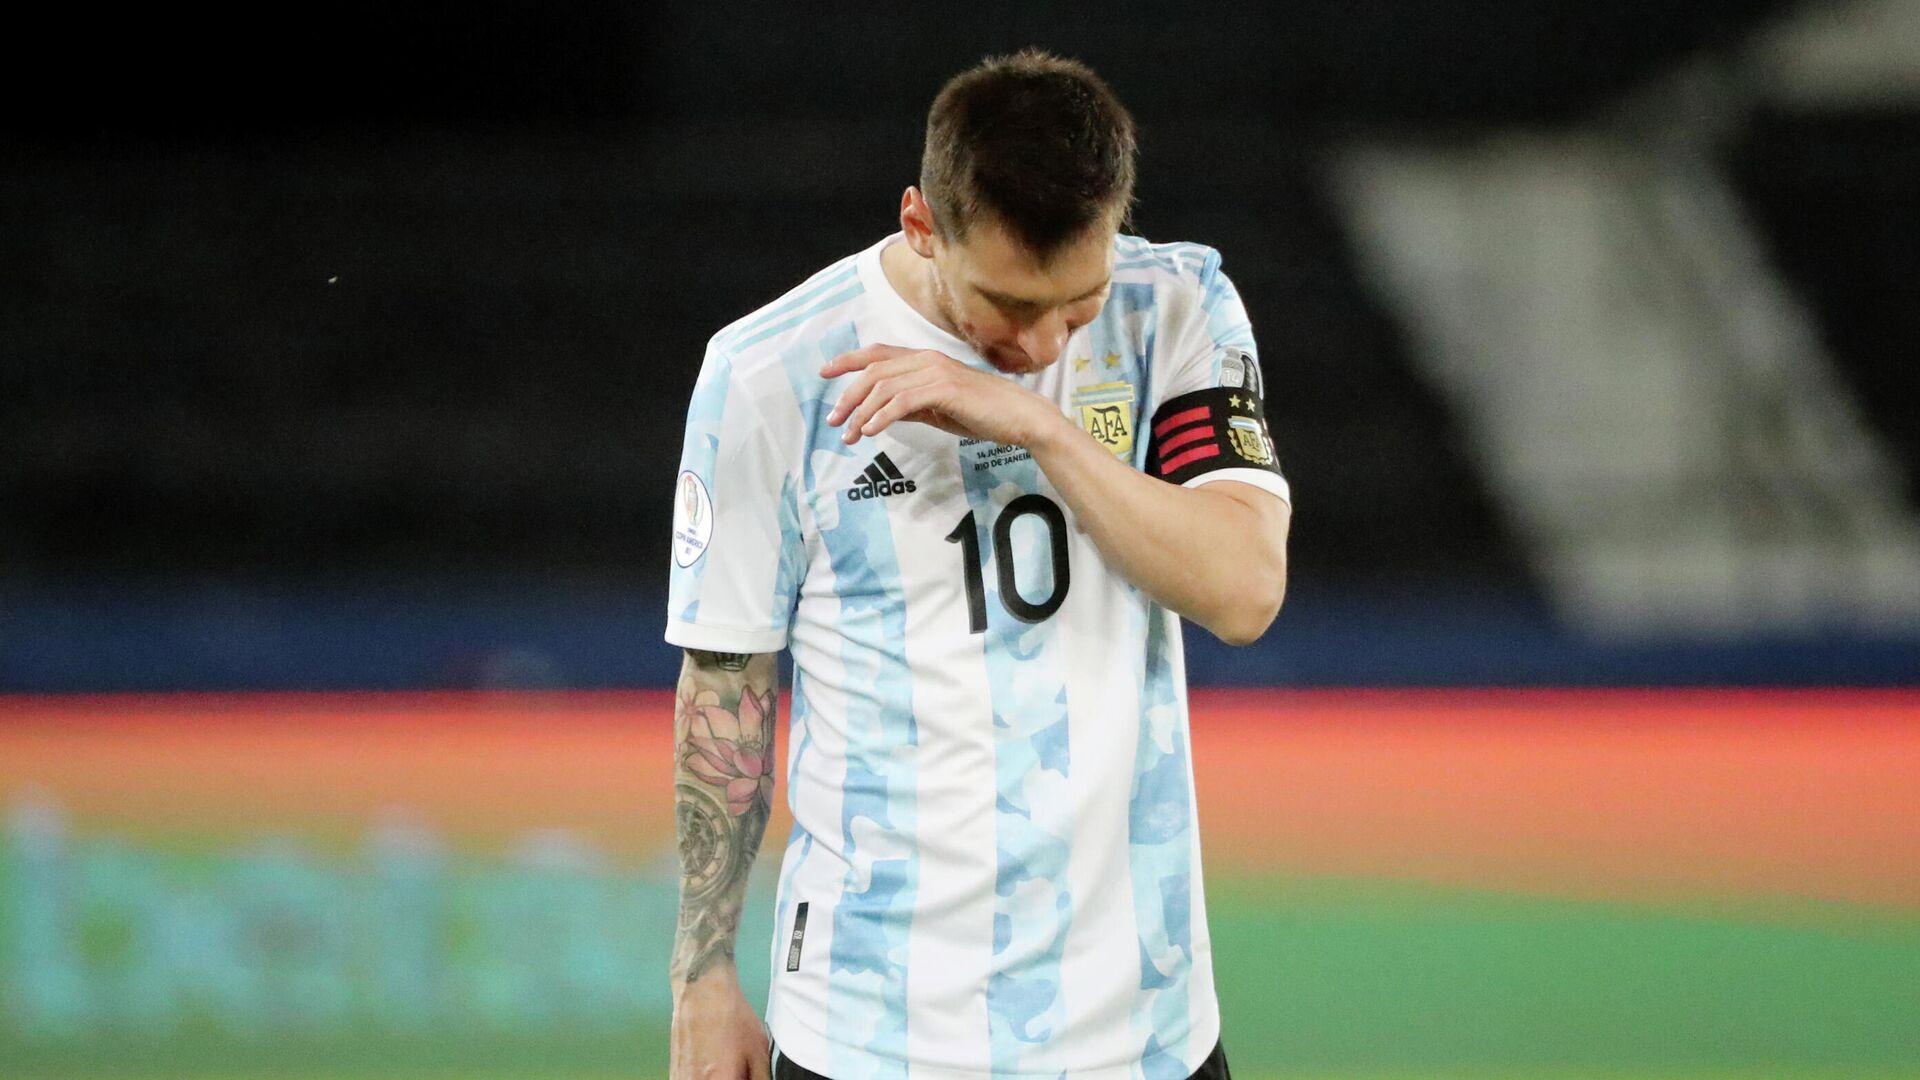 Leo Messi, futbolista argentino - Sputnik Mundo, 1920, 15.06.2021